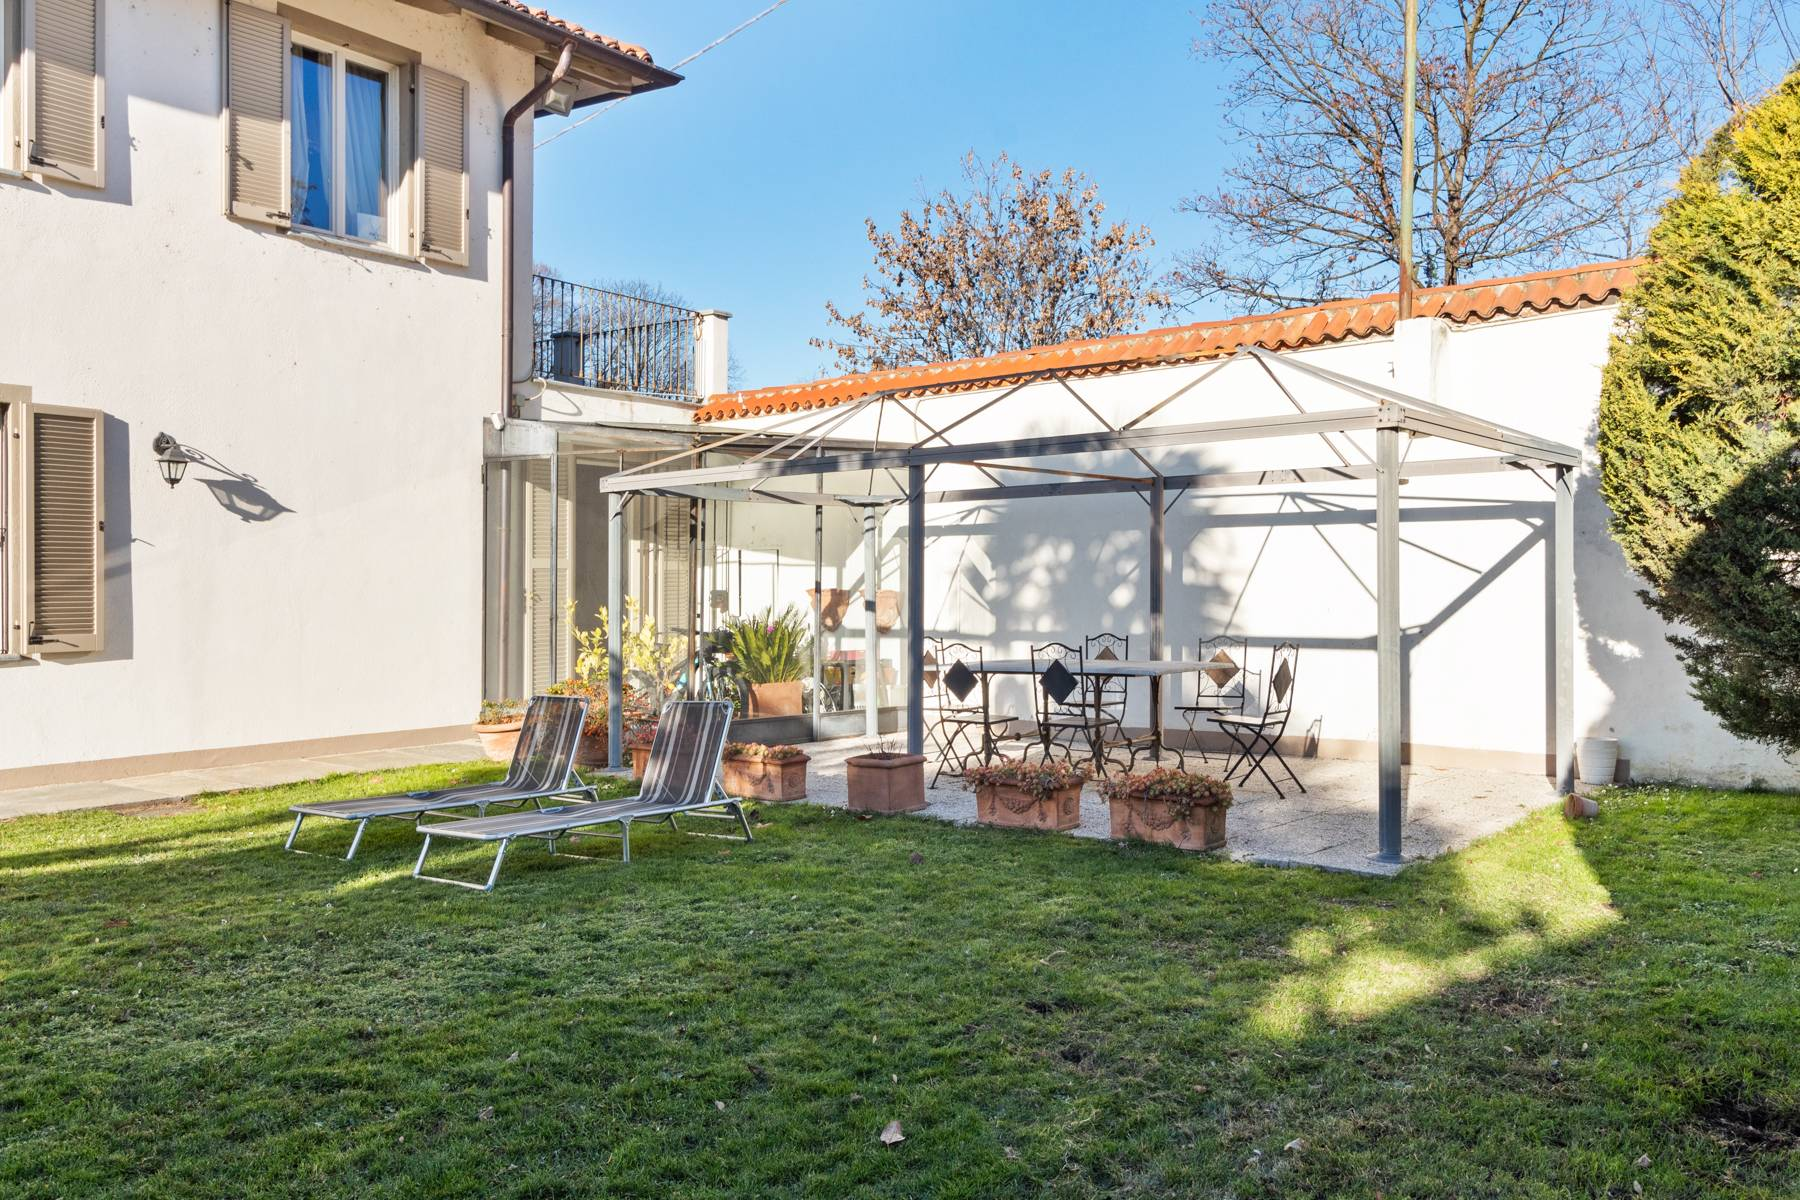 Casa indipendente in Vendita a Torino: 5 locali, 270 mq - Foto 2